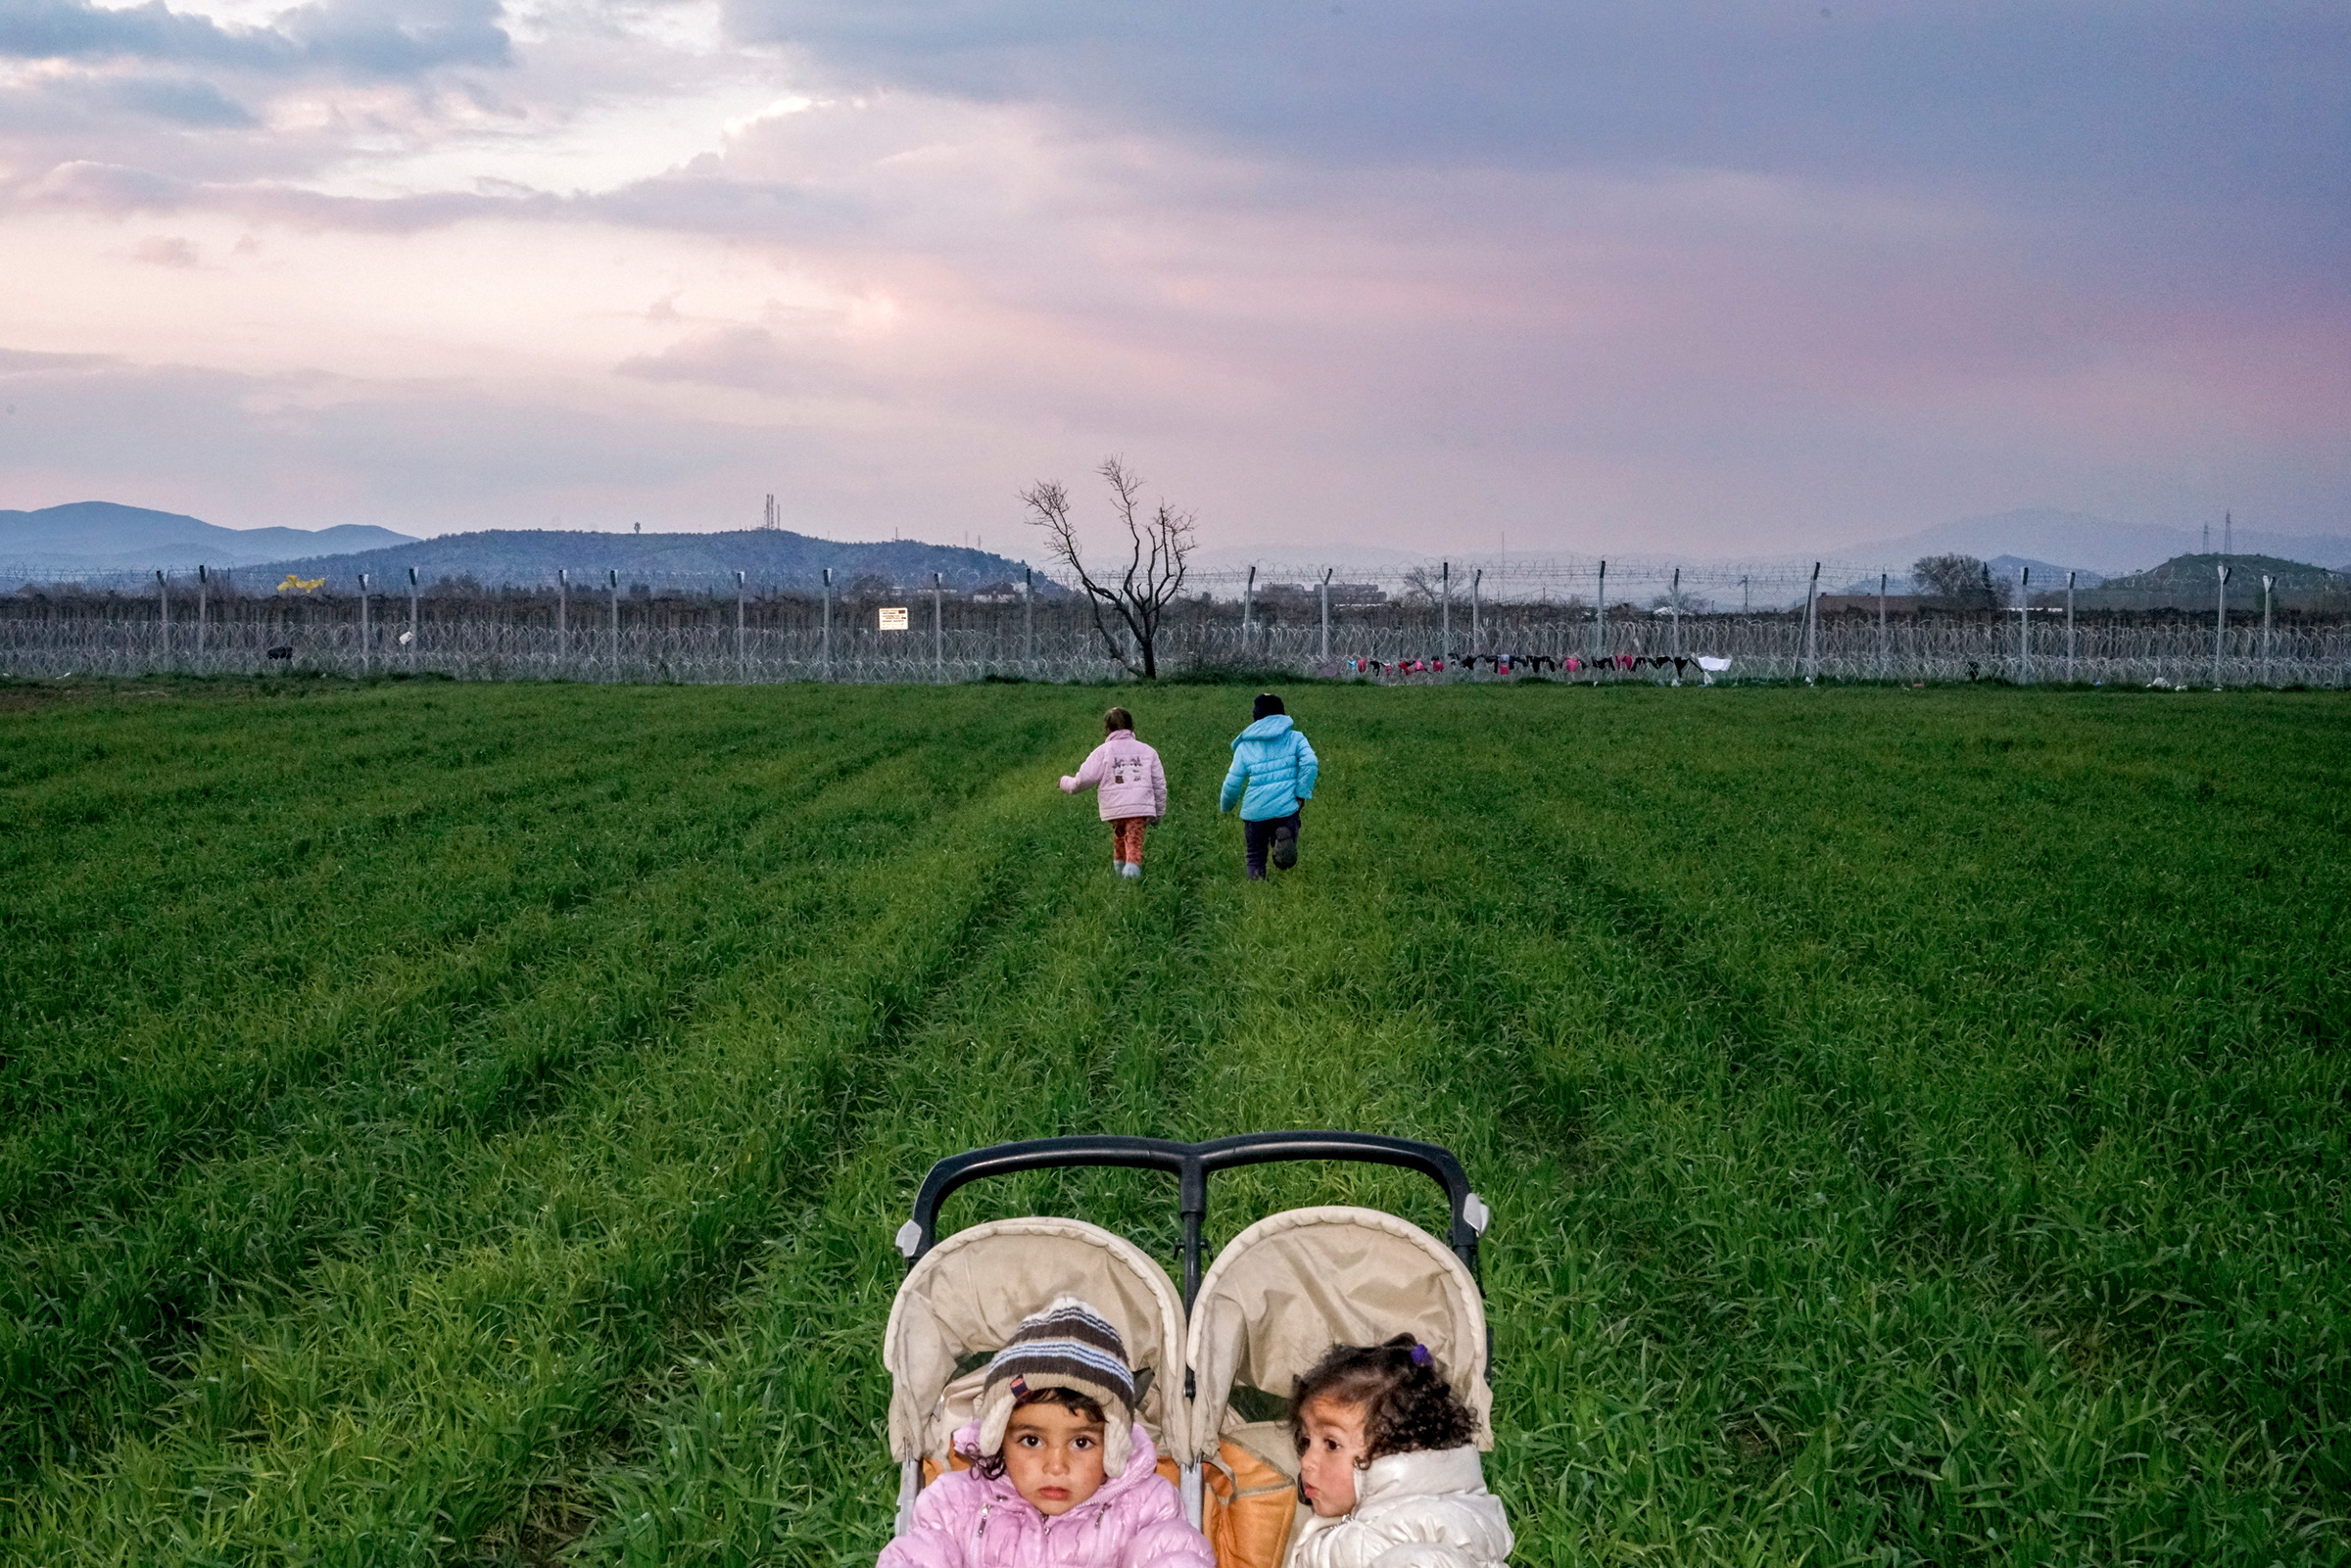 Children in the Idomeni refugee camp on the Greece-Macedonia border after Macedonia sealed its border. Idomeni. Greece, 2016.